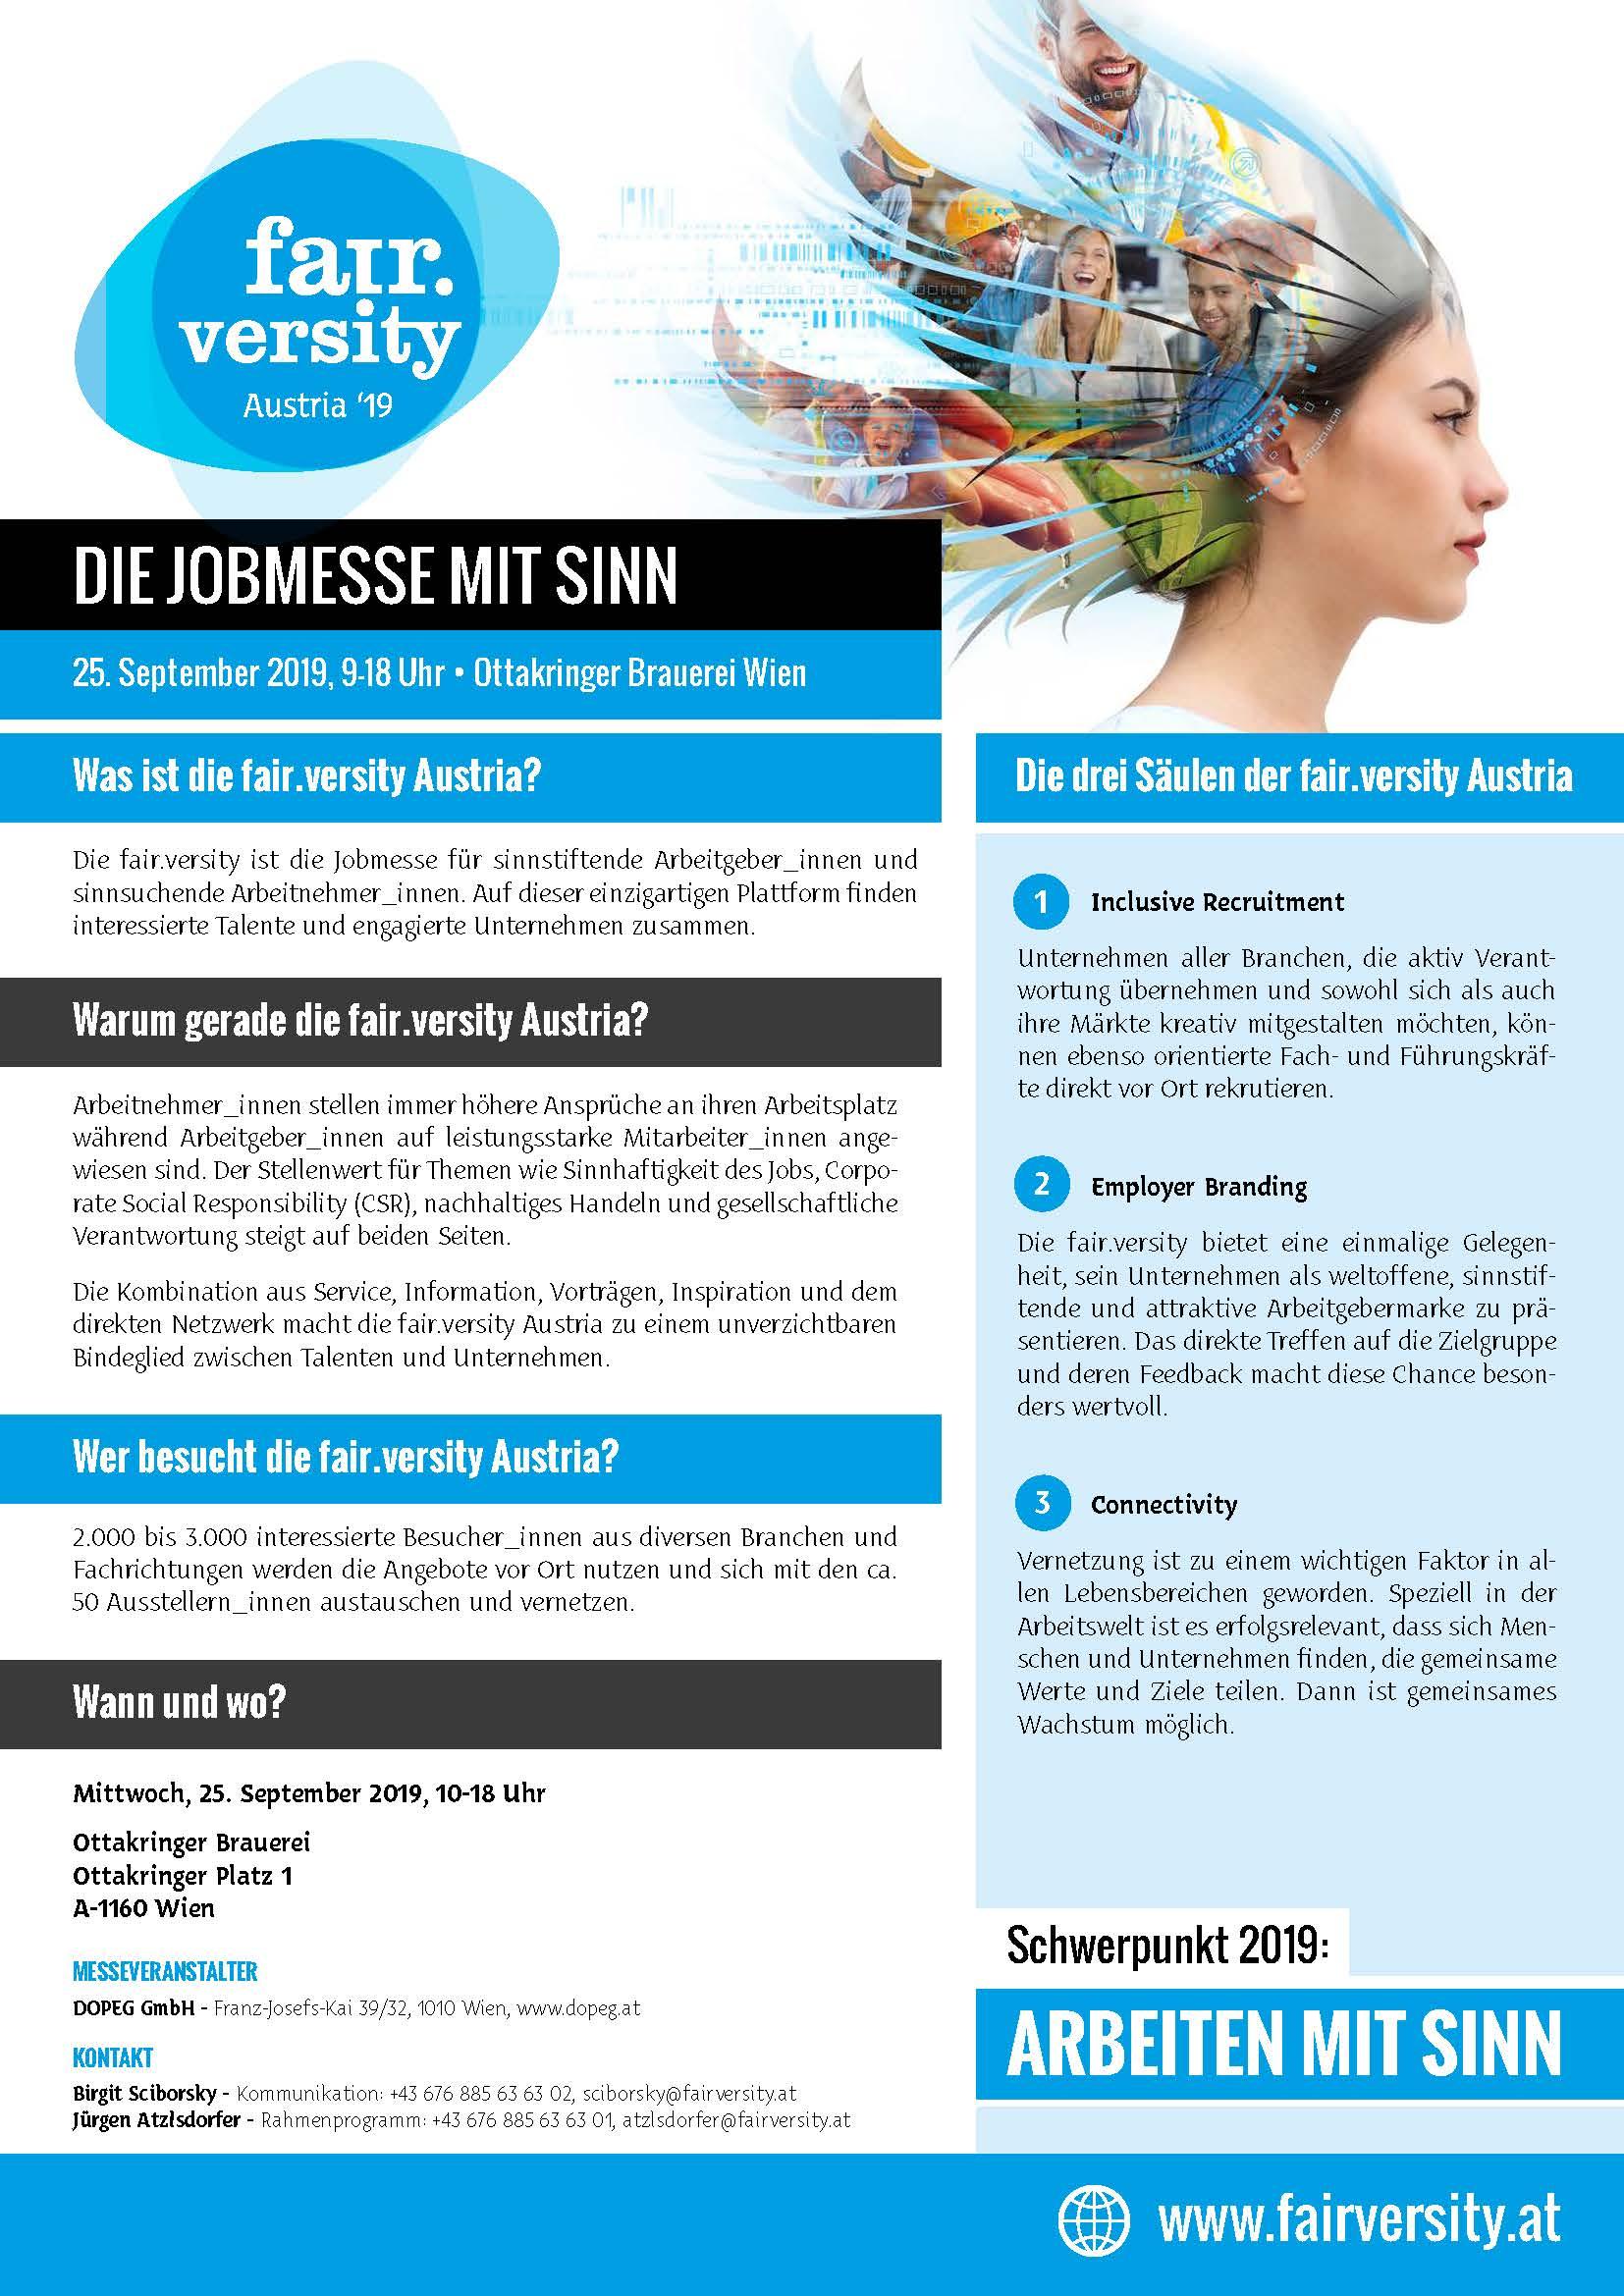 fair.versity OnePage-Infos